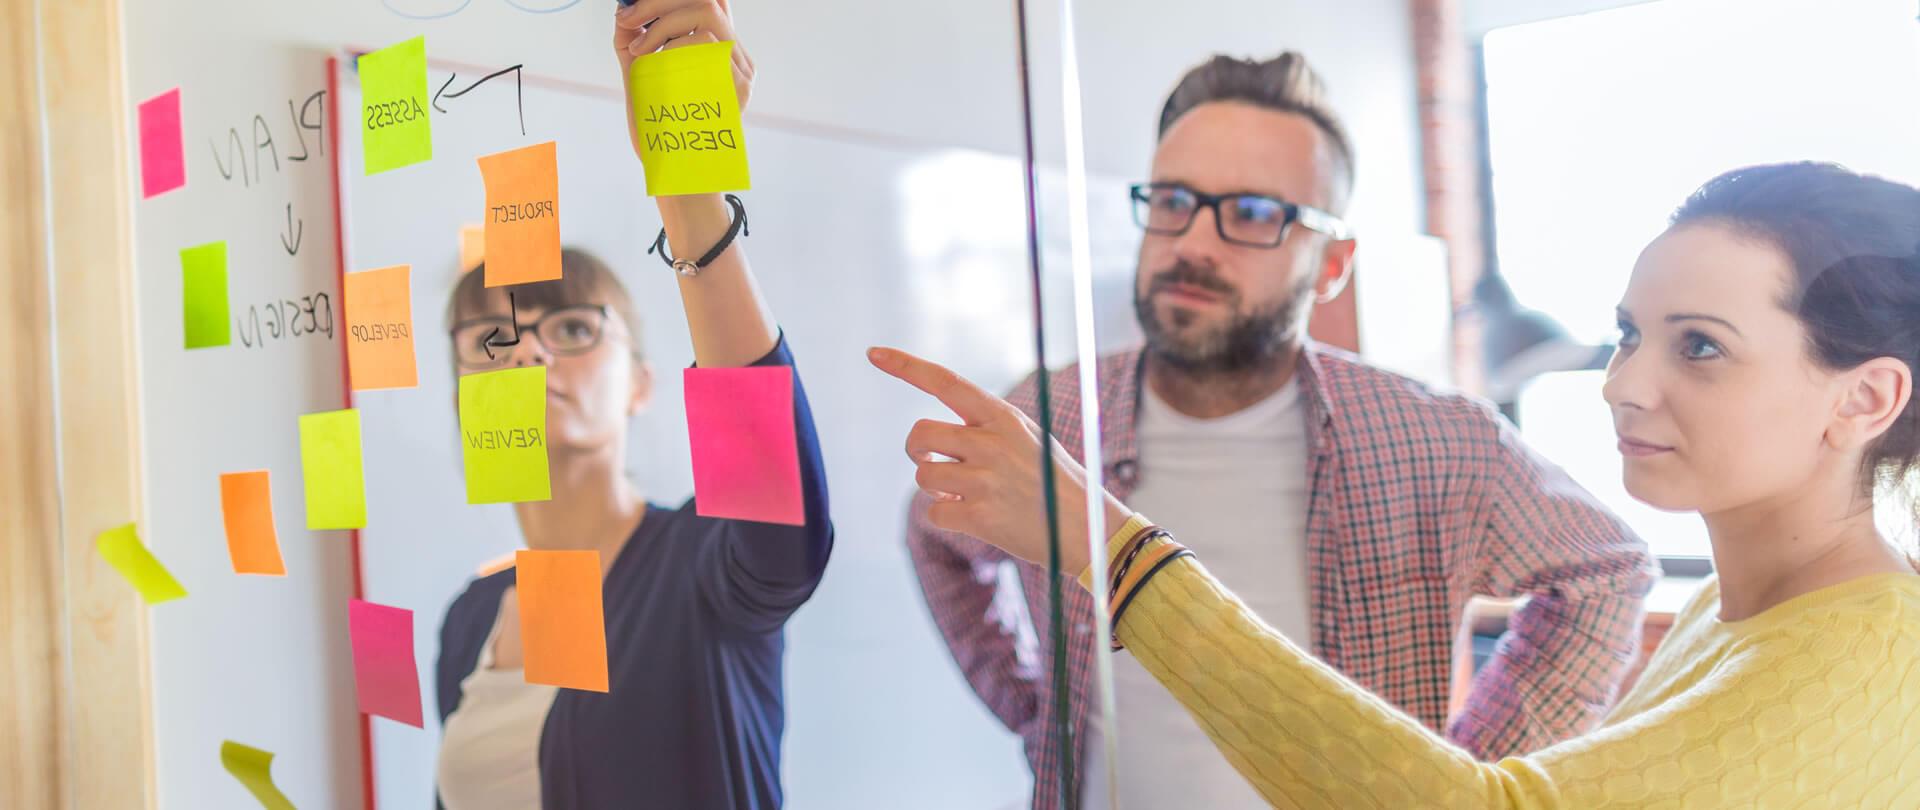 EE: Design Thinking in Practice